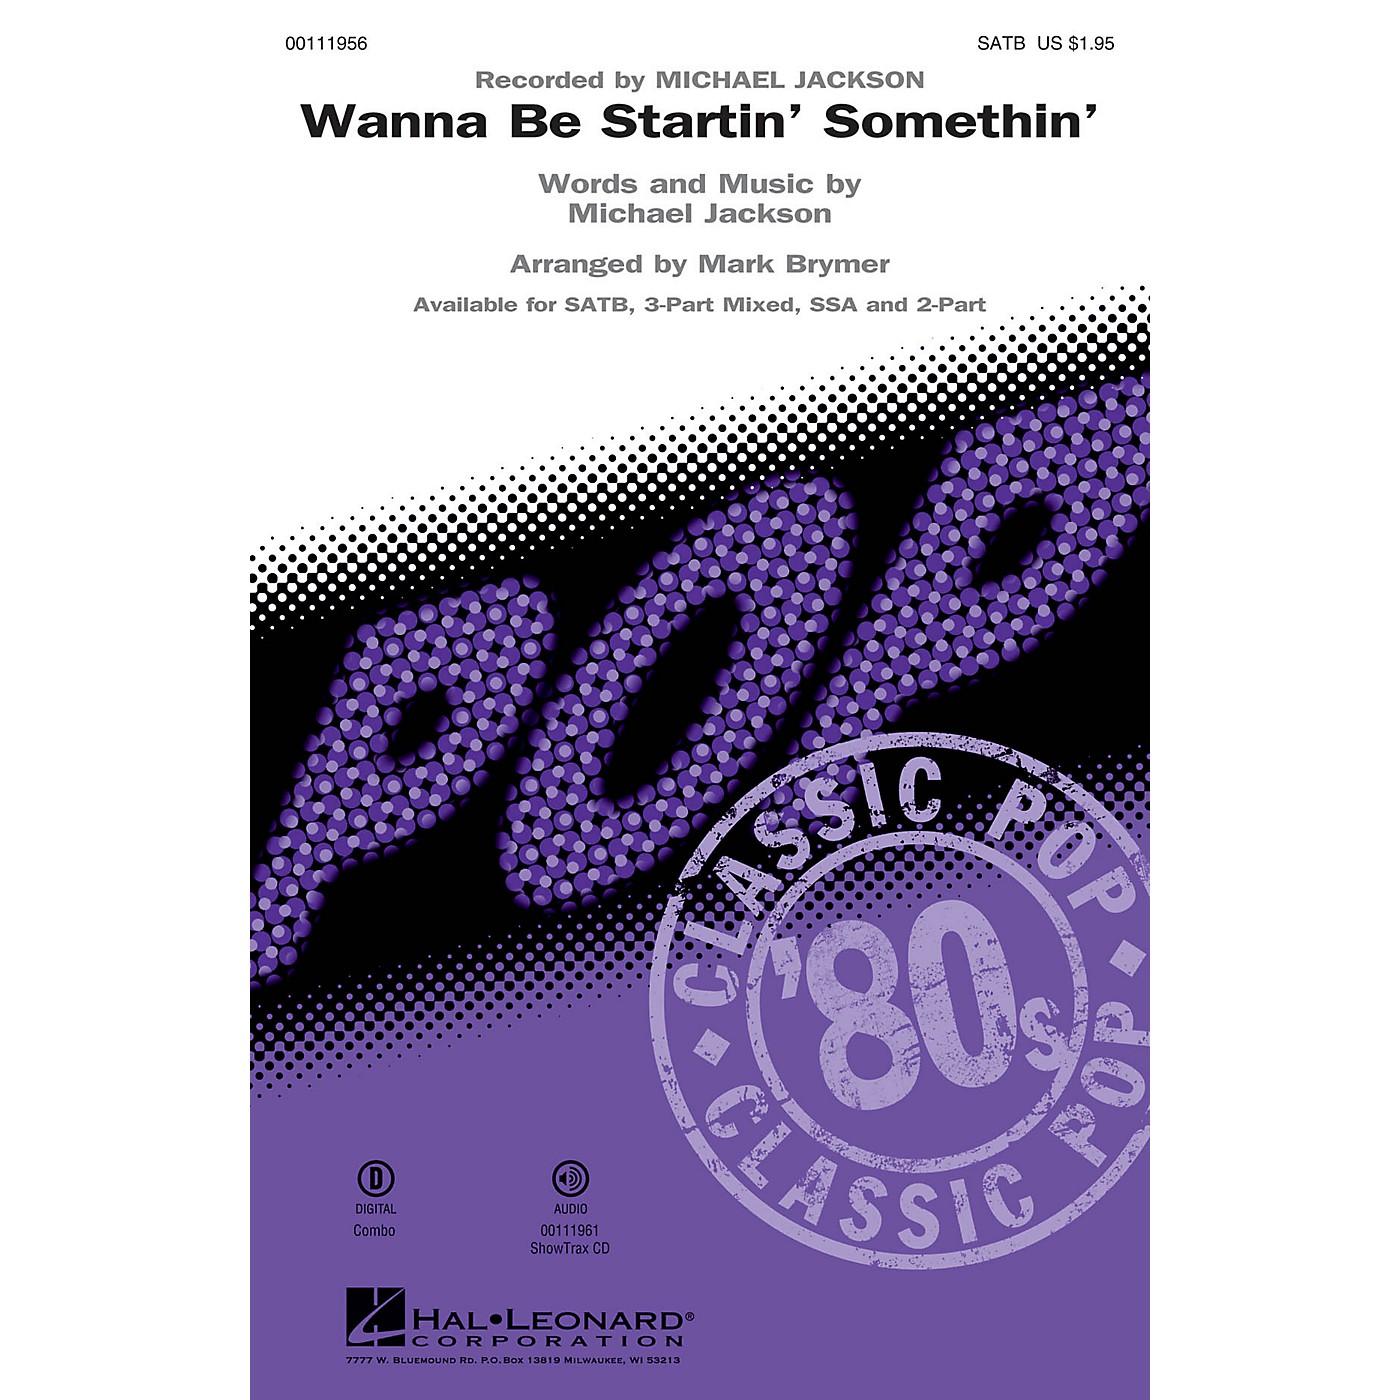 Hal Leonard Wanna Be Startin' Somethin' (3-Part Mixed) 3-Part Mixed by Michael Jackson Arranged by Mark Brymer thumbnail